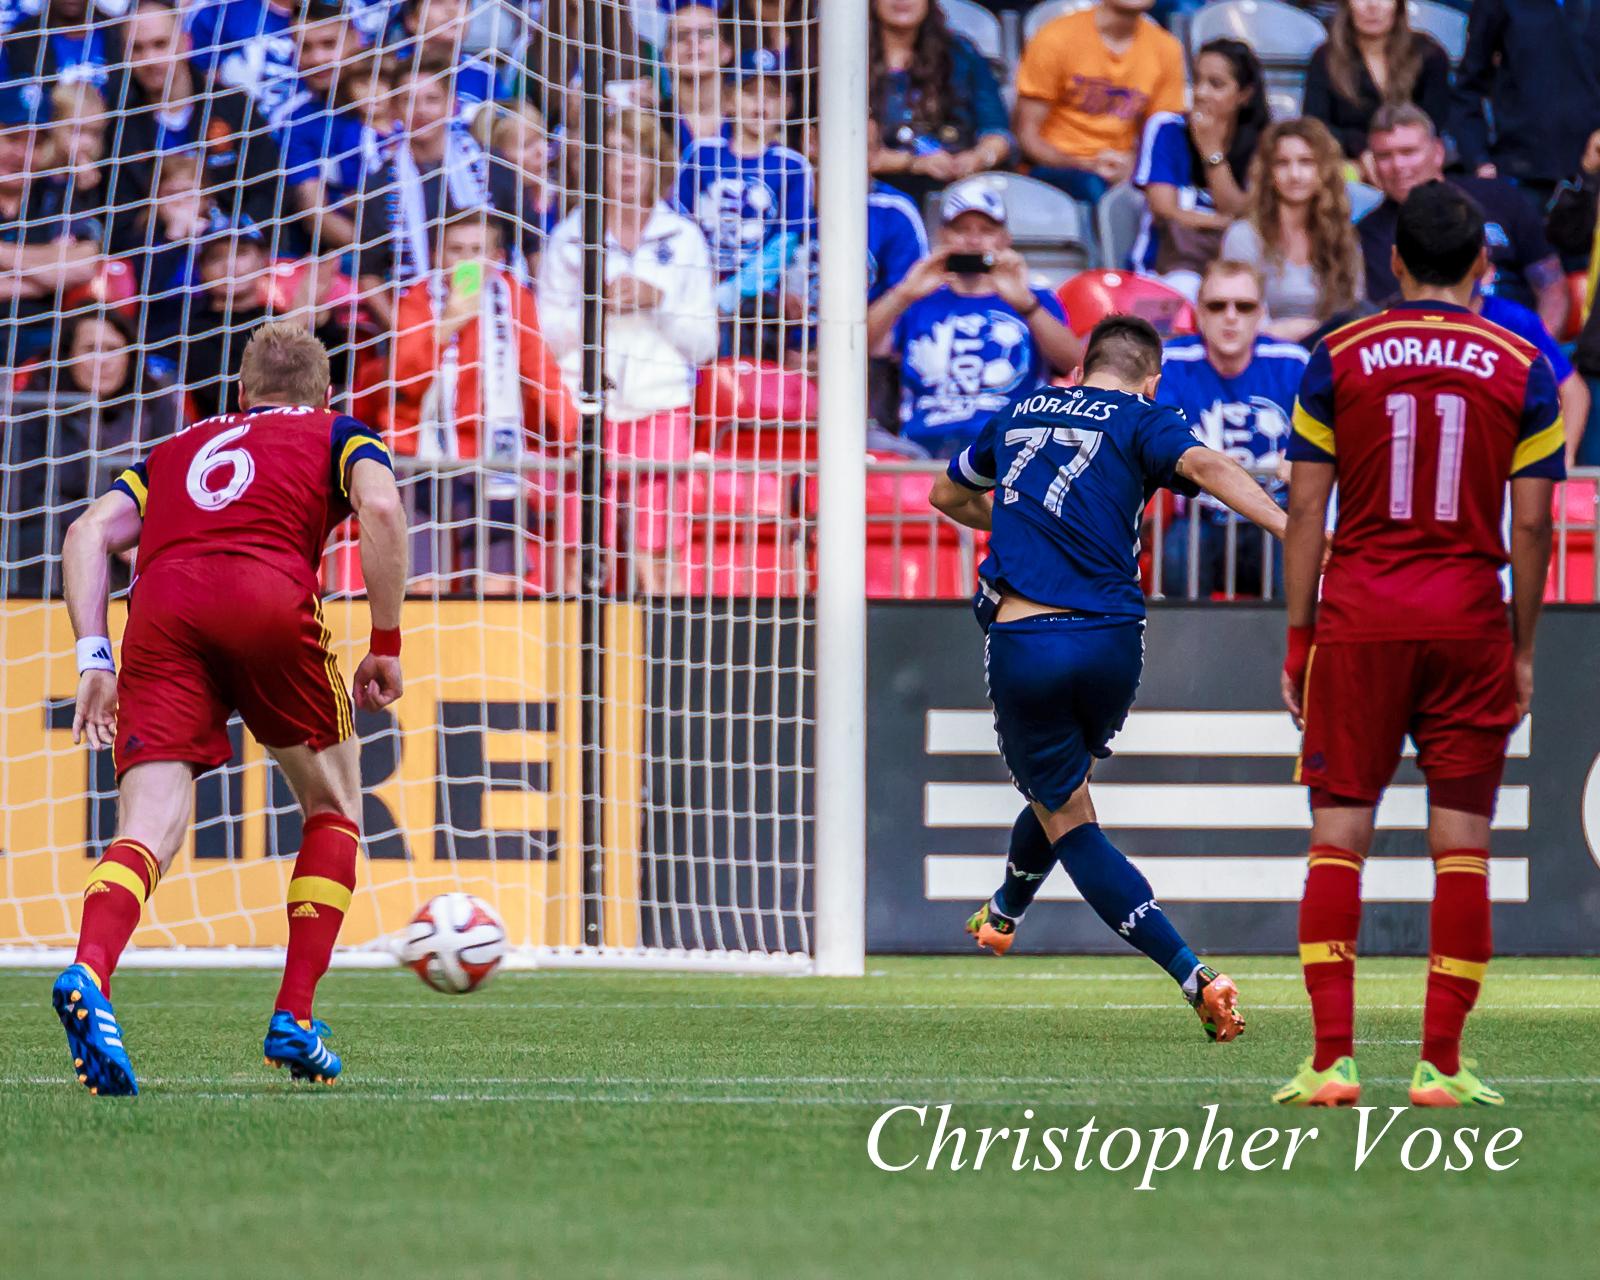 2014-09-27 Pedro Morales' First Goal (Penalty Kick).jpg